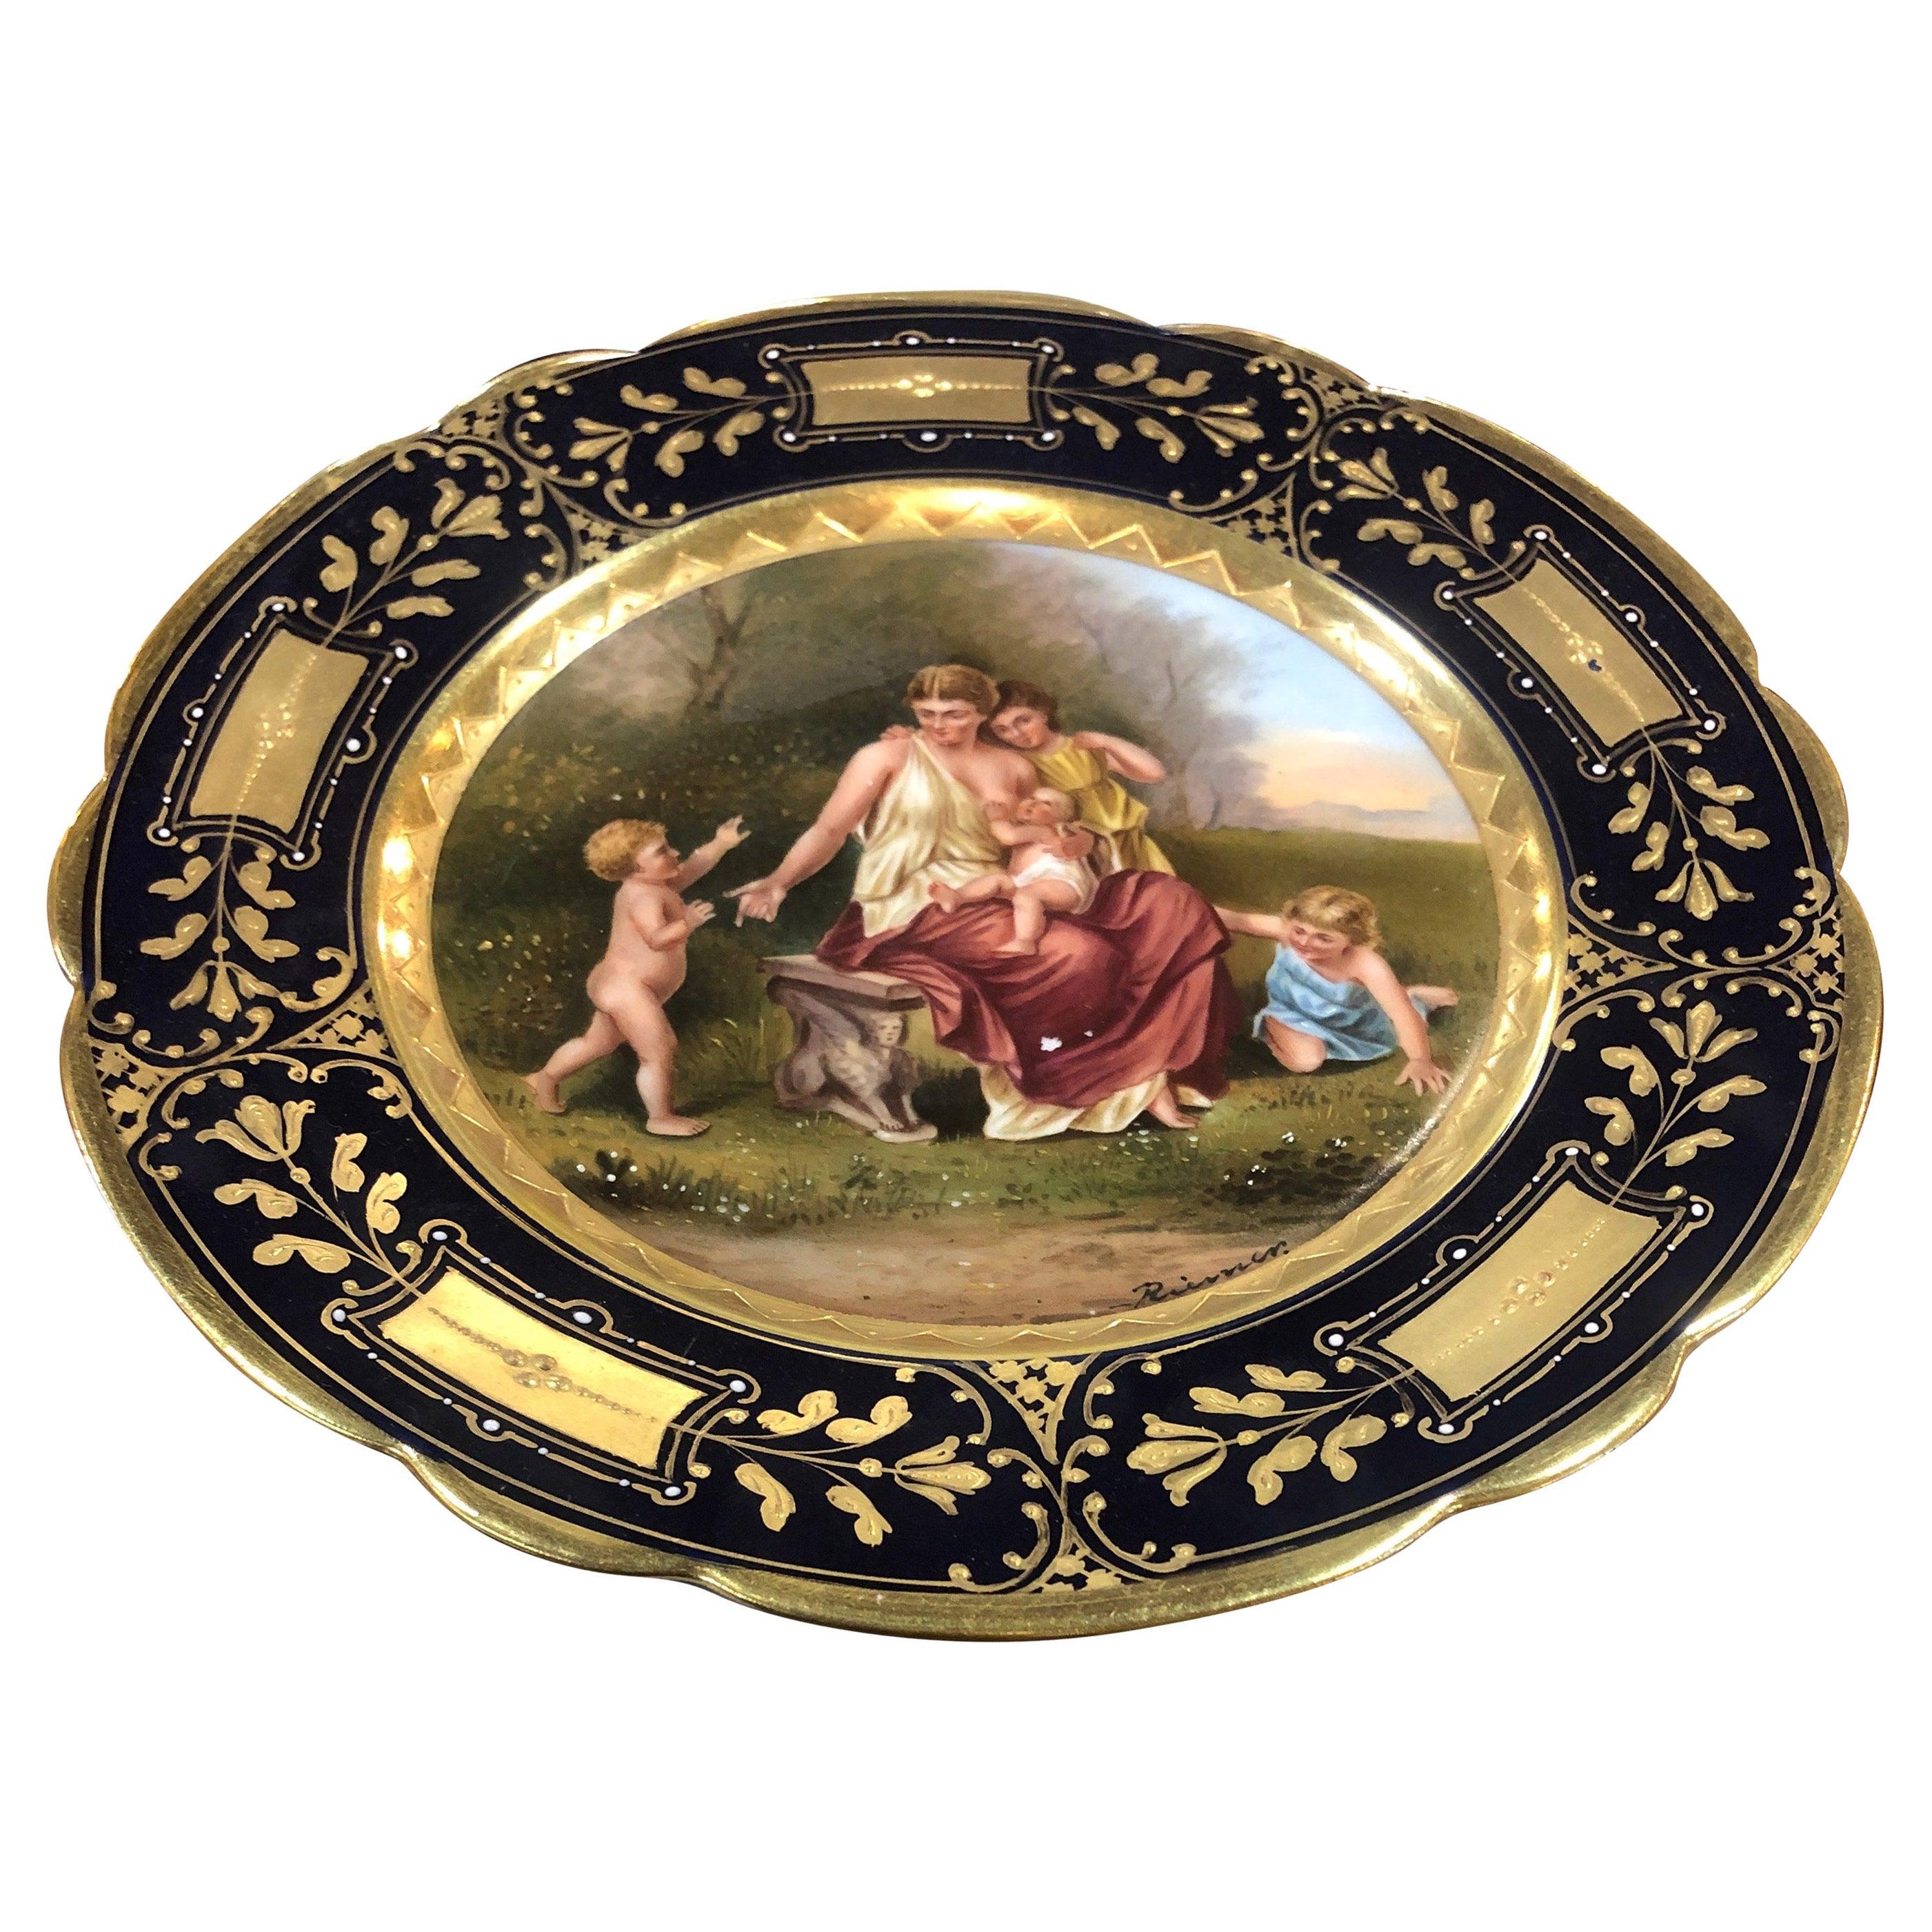 19th Century Biedermeier Porcelain Royal Vienna Hand Painted and Gilt, 1870s